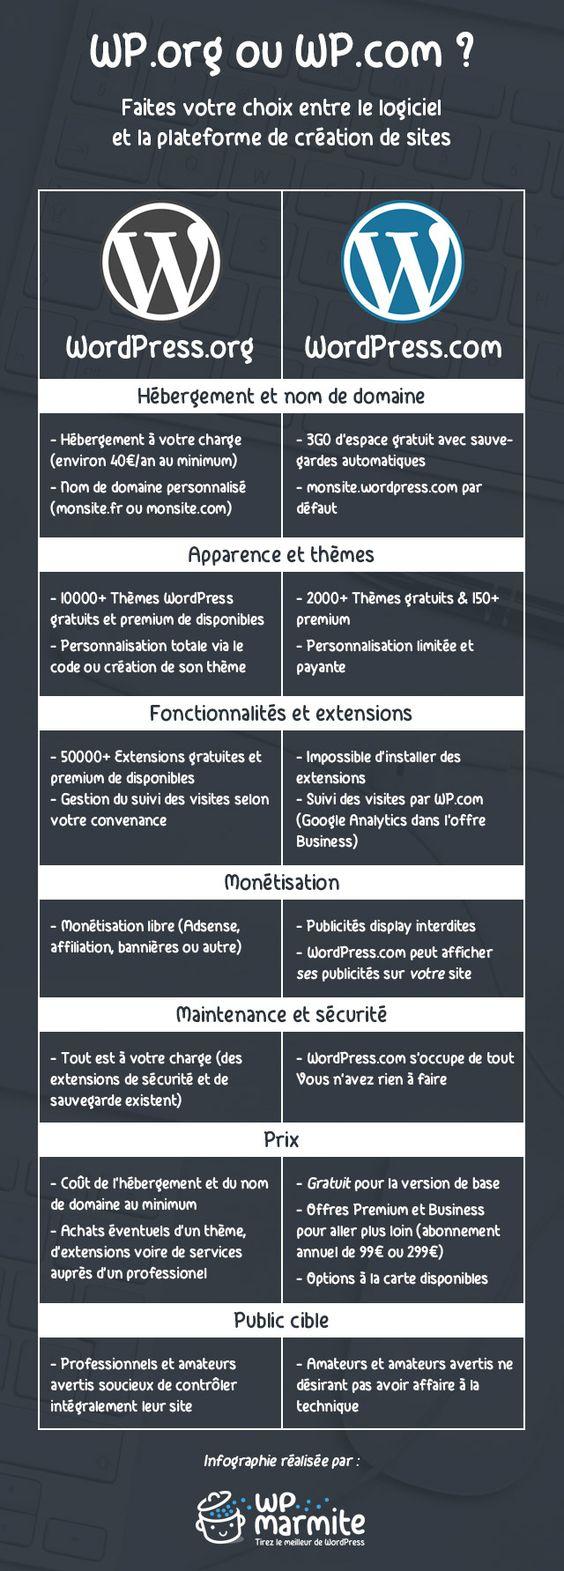 WordPress.com / WordPress.org : quelles différences ?